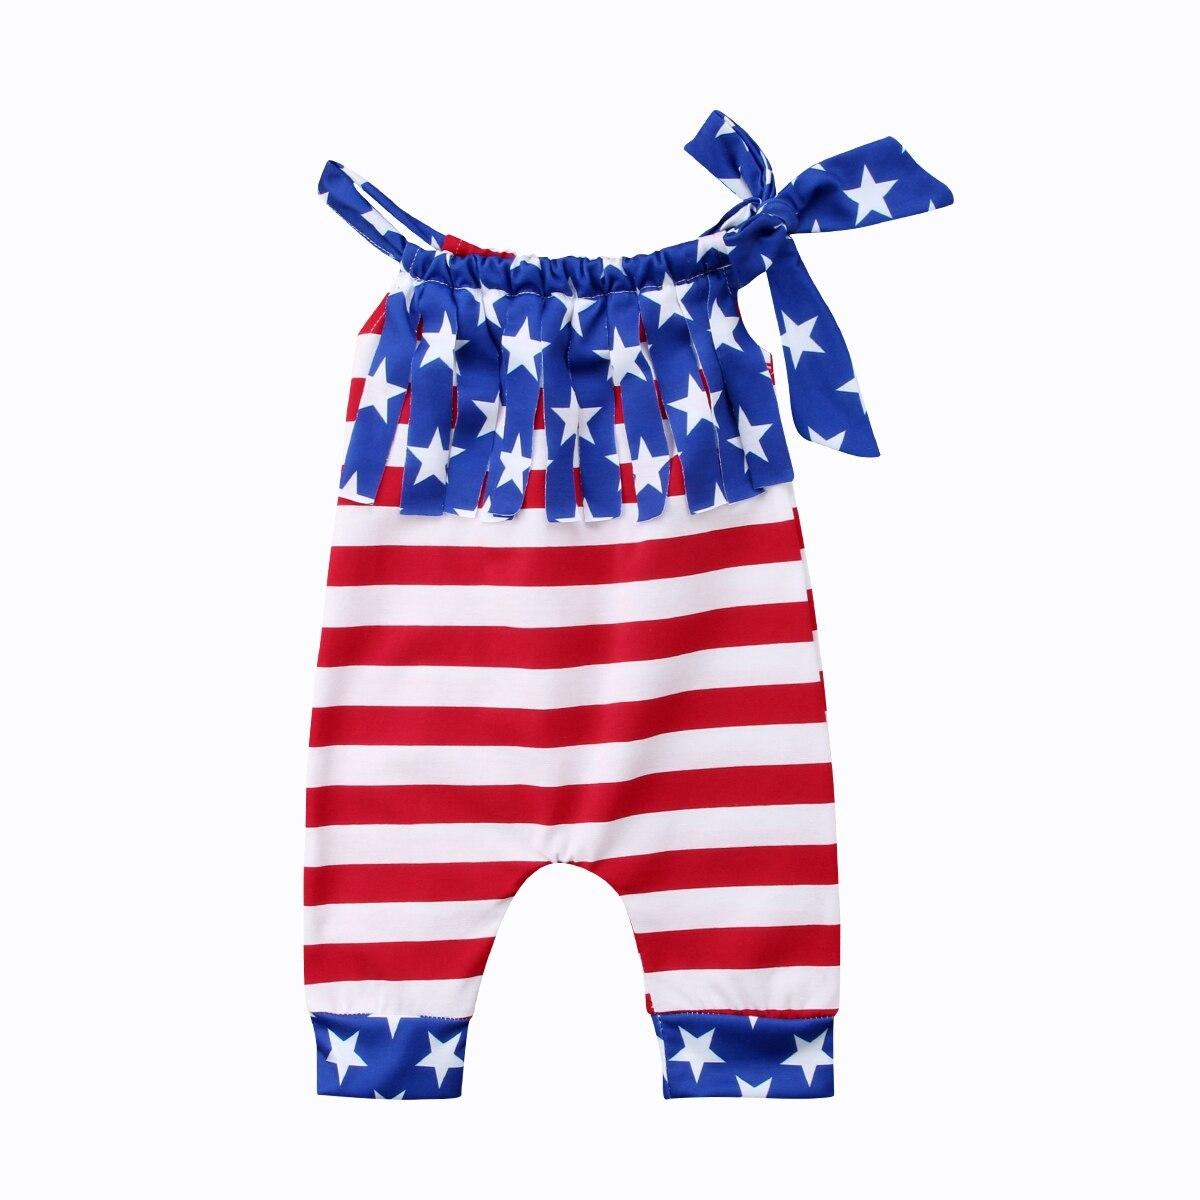 Infant Baby Girl  Outfit Romper Tutu Pants Headband 3PCS SET  Newborn Baby Girls